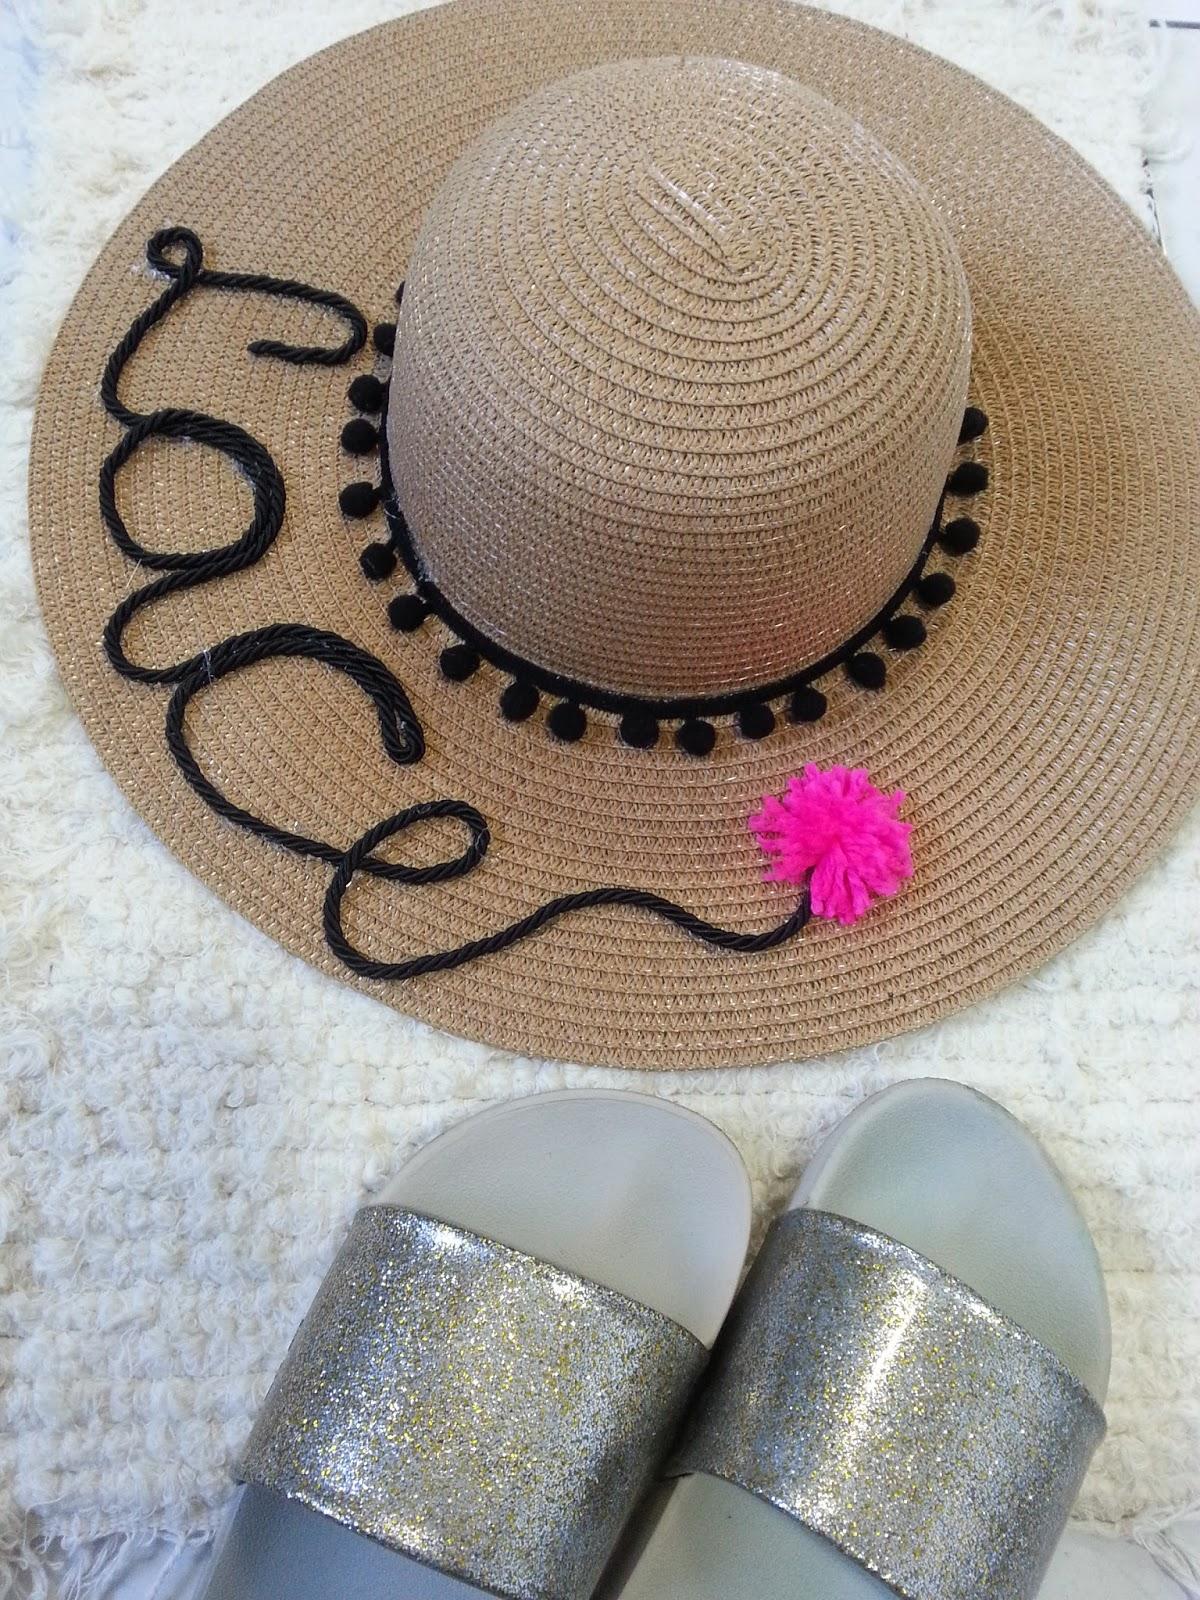 Lace Moraes  DIY  Chapéu de Praia Personalizado 401a444a4f3